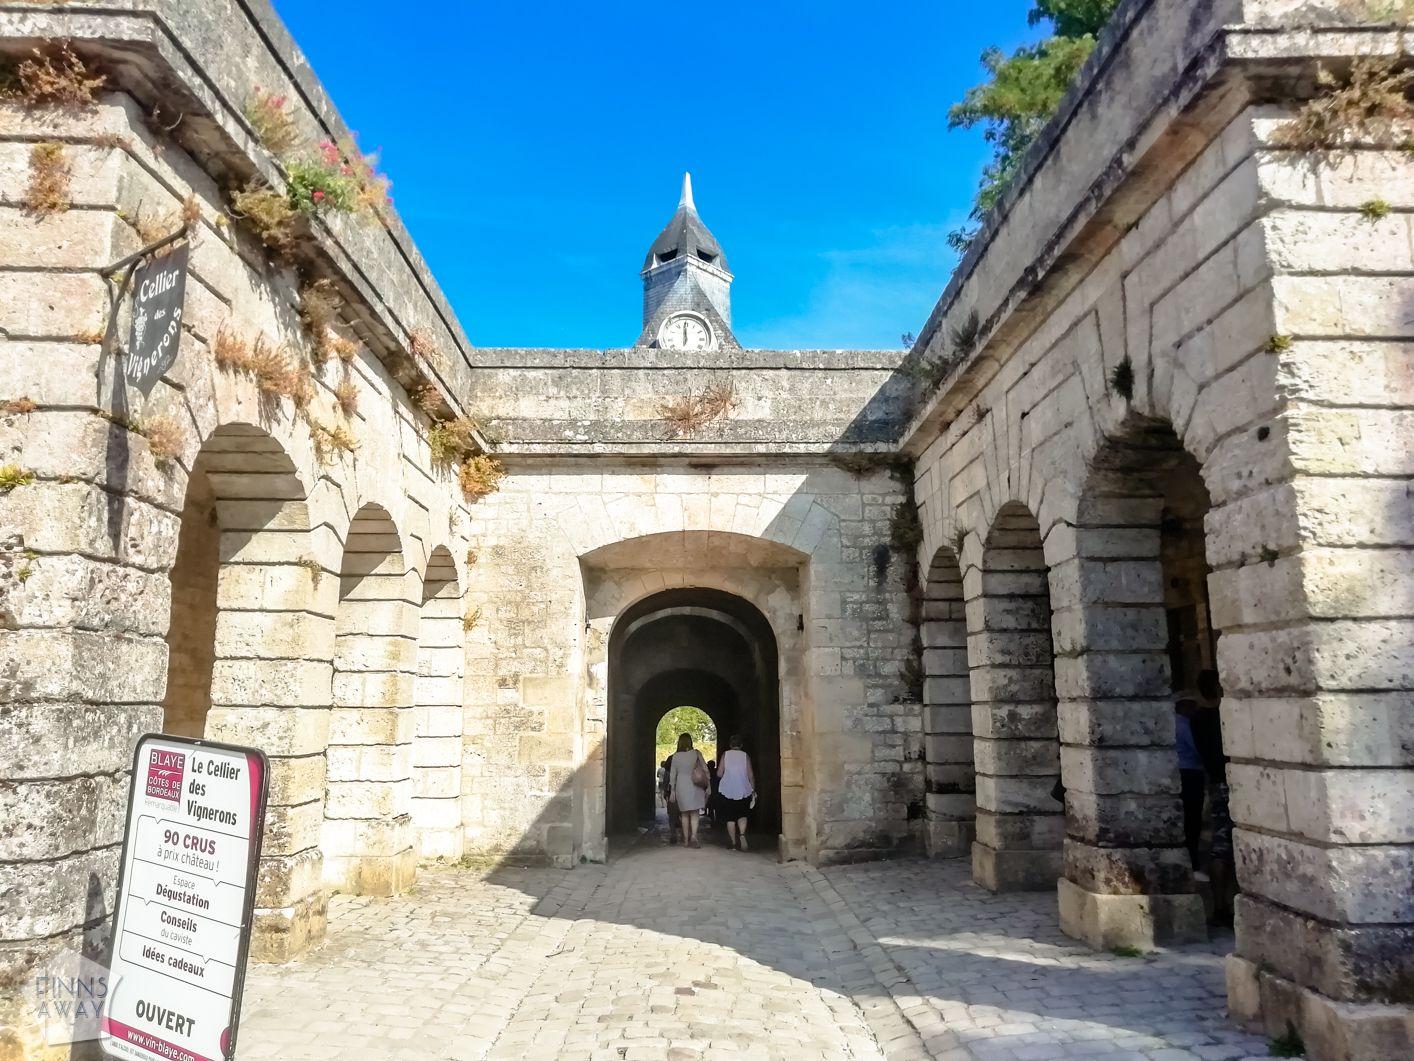 In the citadel of Blaye, France | FinnsAway Travel Blog